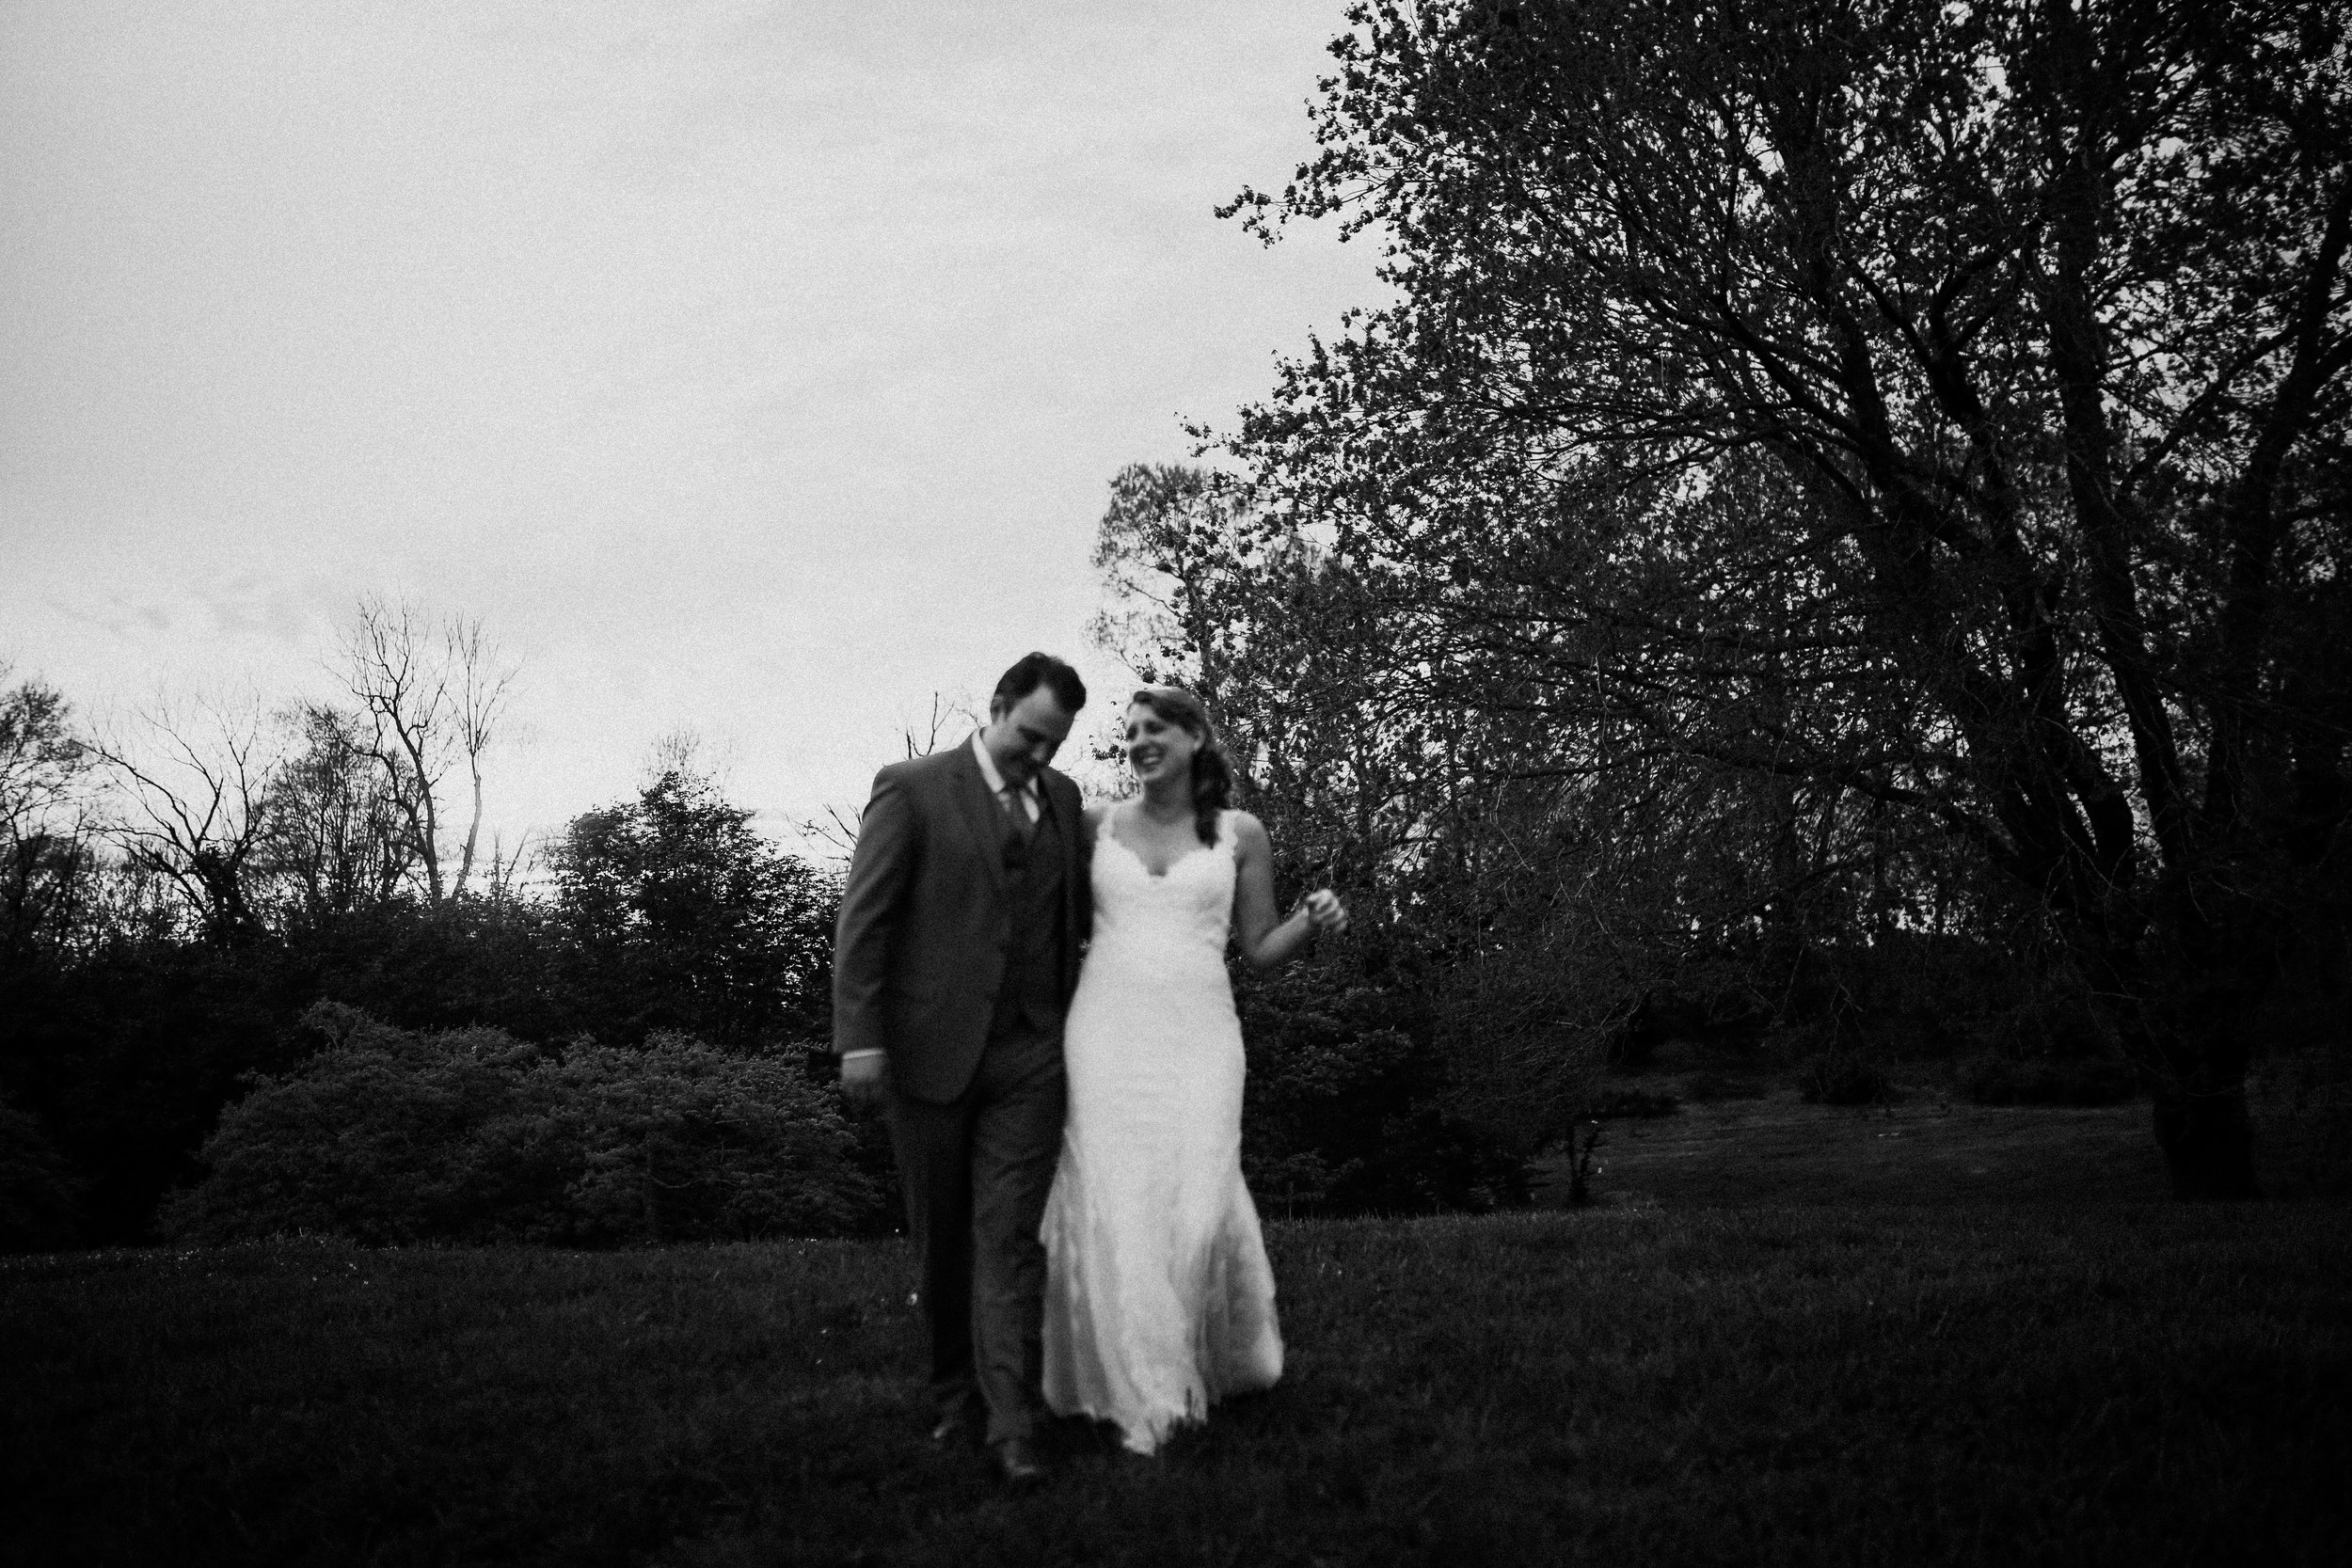 TheGreens_Married_2019-537.jpg